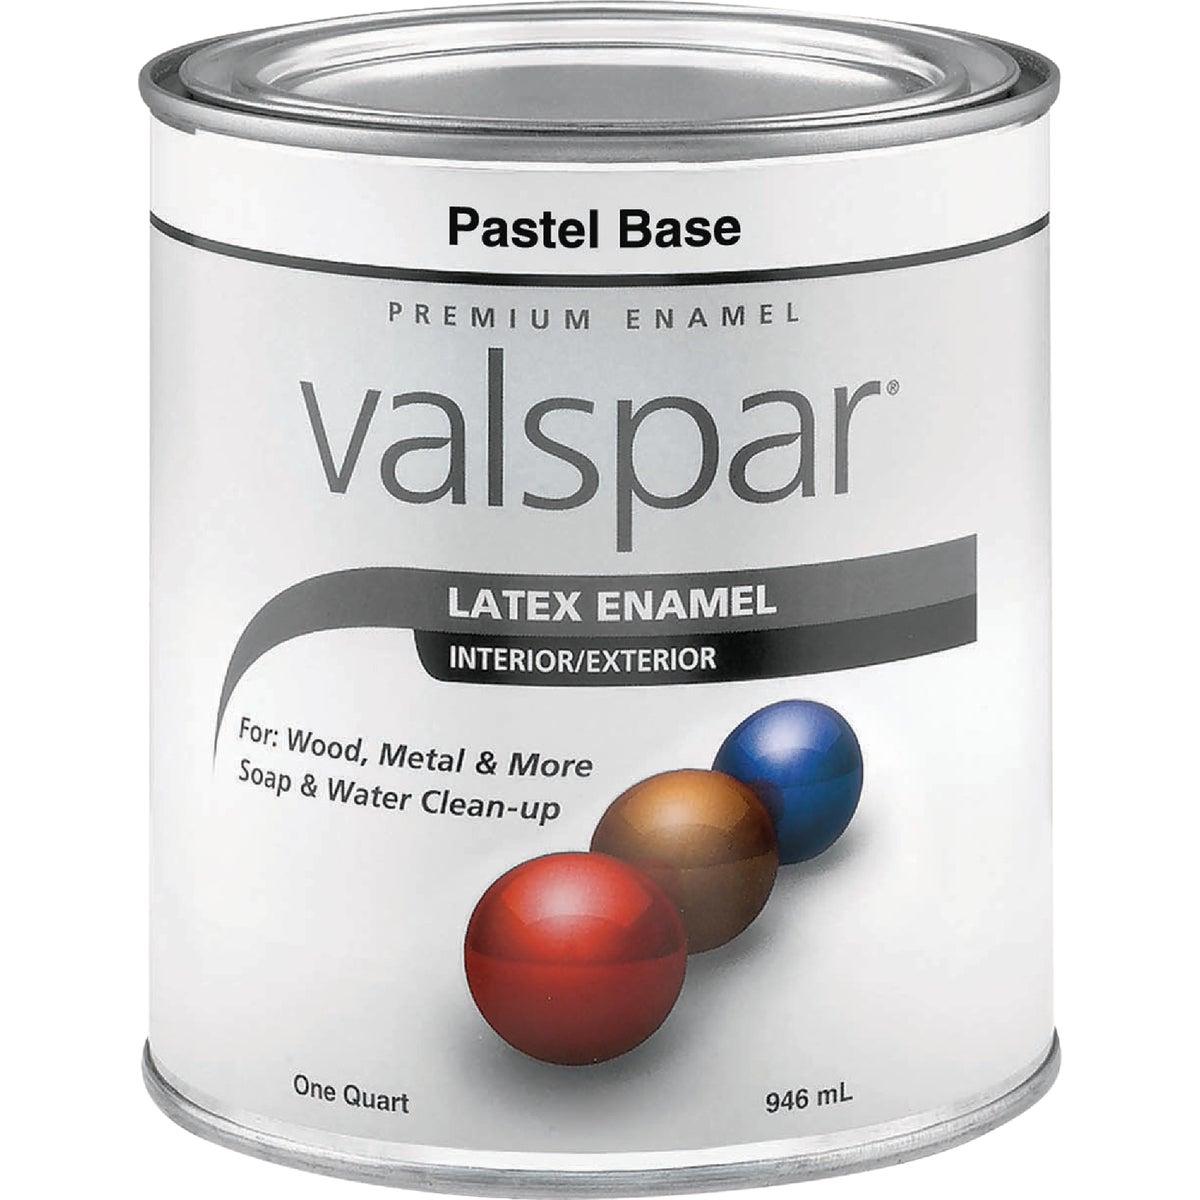 LTX PASTEL BS ENAMEL - 410.0065101.005 by Valspar Corp